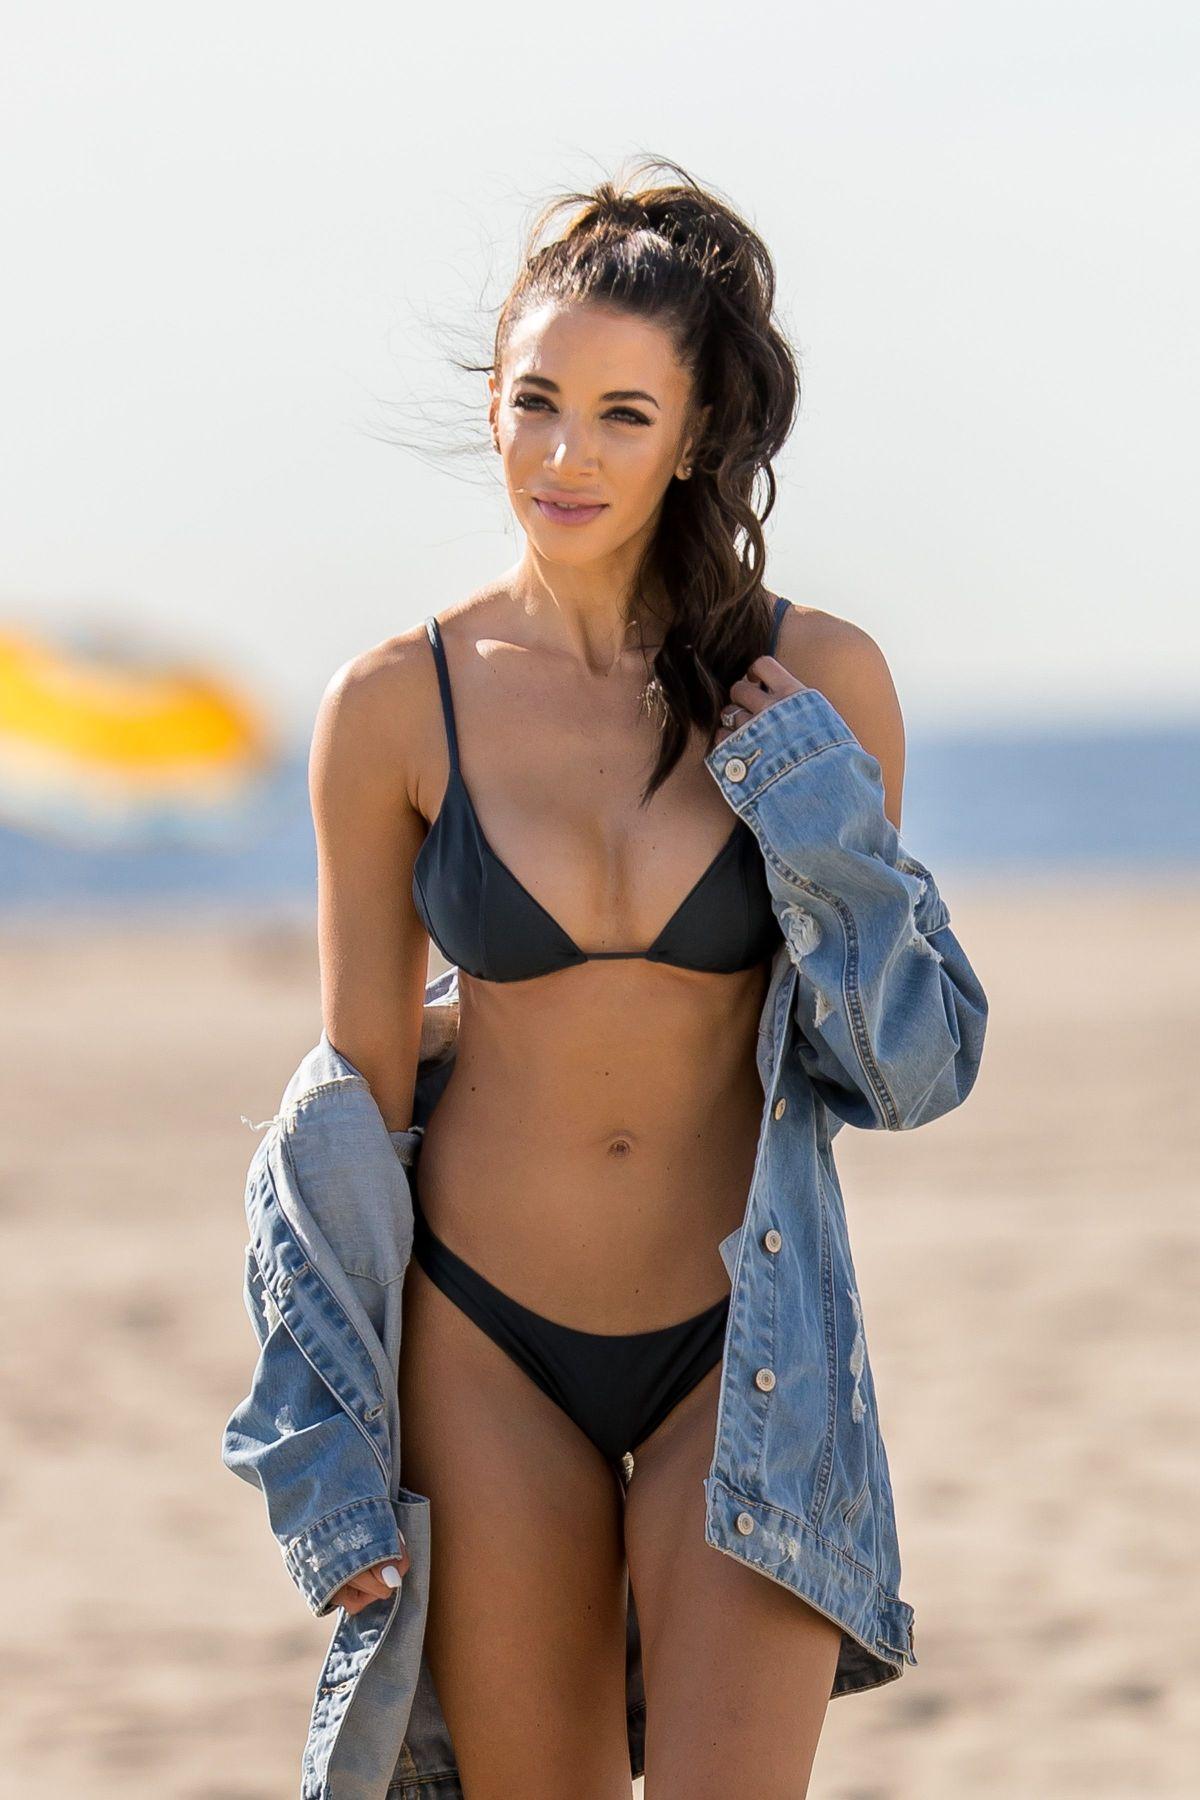 Casey Martin in Black Bikini on the beach in Santa Monica Pic 9 of 35